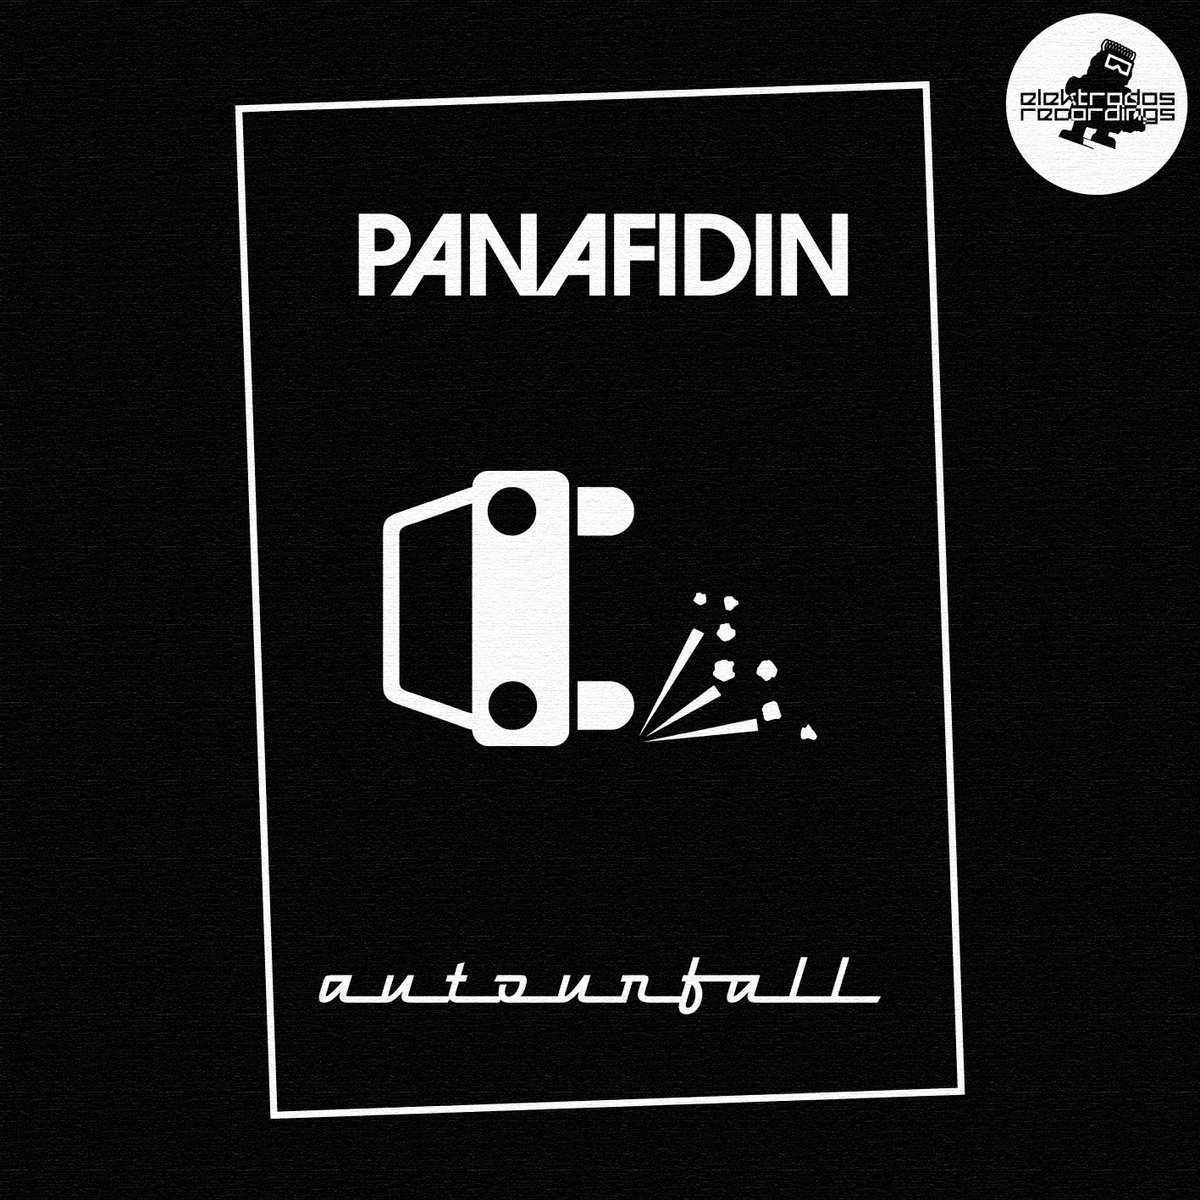 E2REC009] Panafidin - Autounfall | Elektrodos Recordings